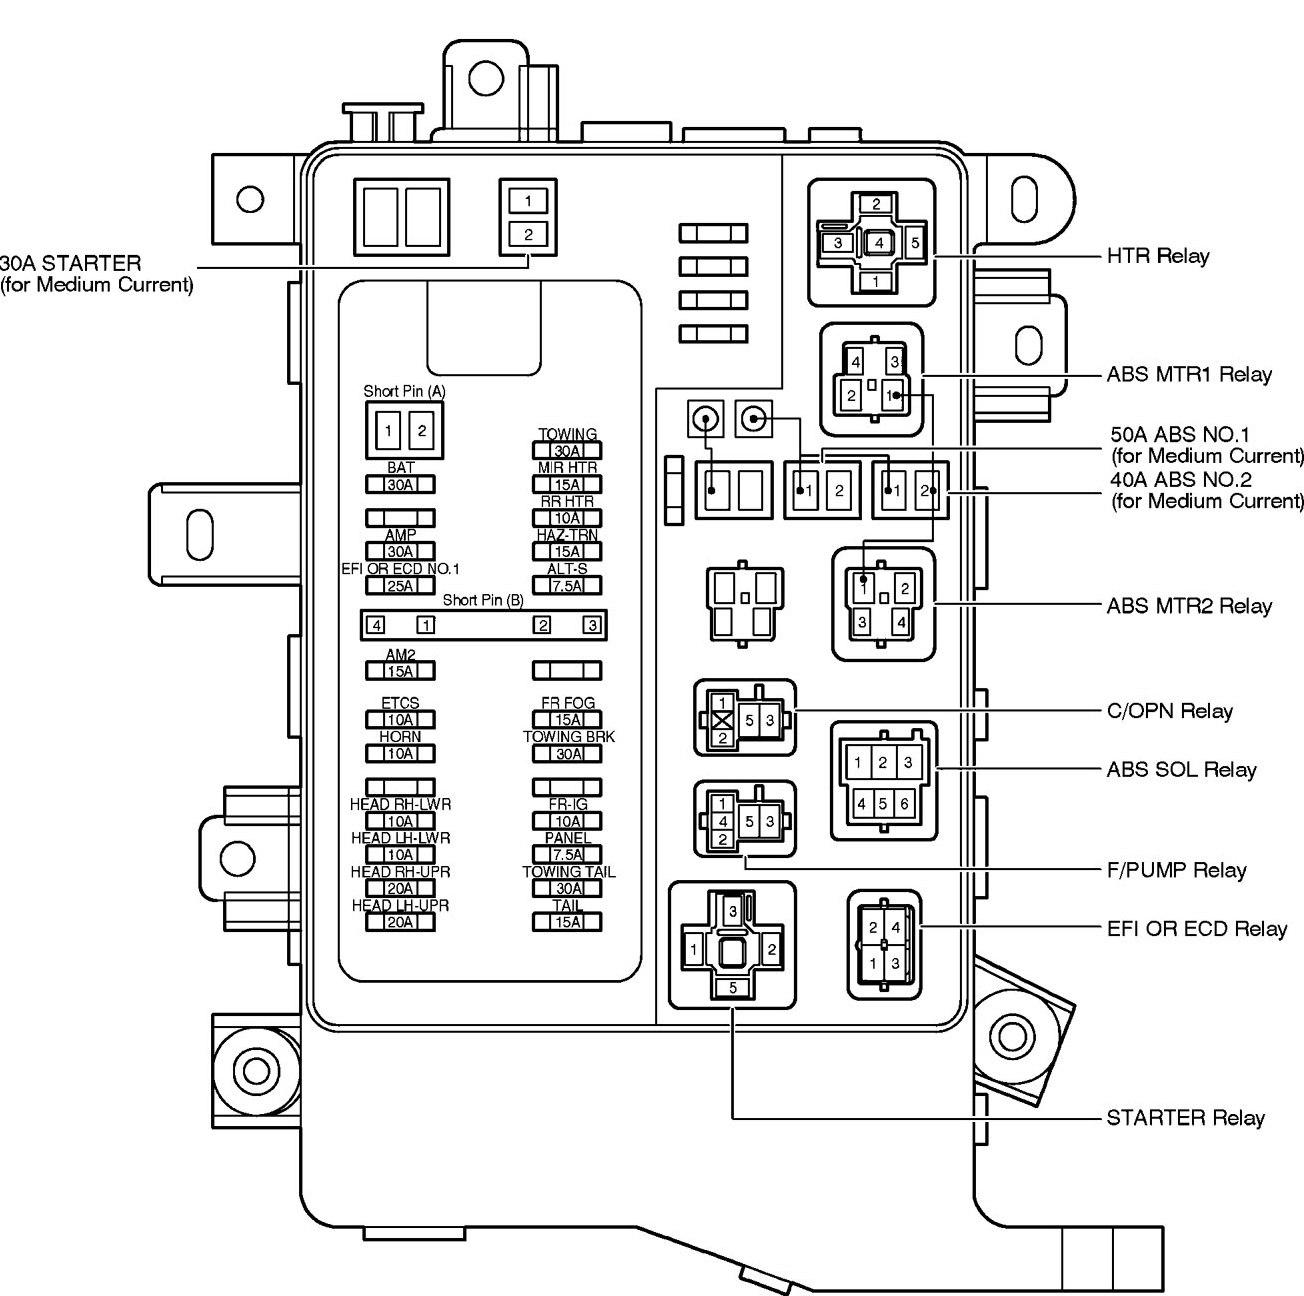 2001 Toyota Land Cruiser Fuse Box Diagram Schematics Wiring Highlander 1992 Database 2009 Tacoma